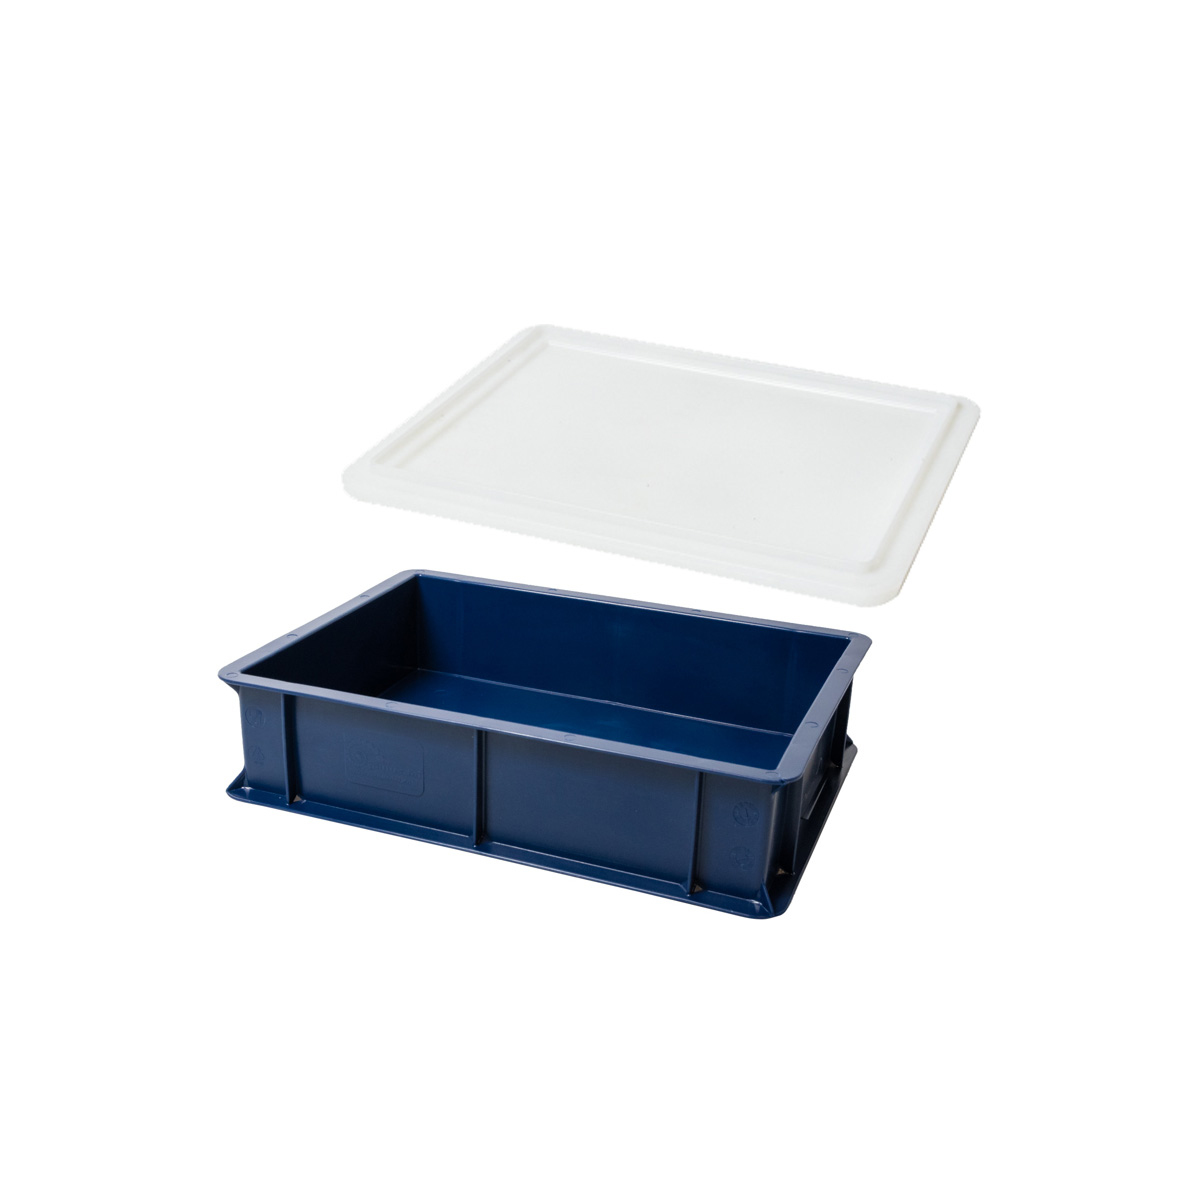 Deglåda blå 40x30 cm